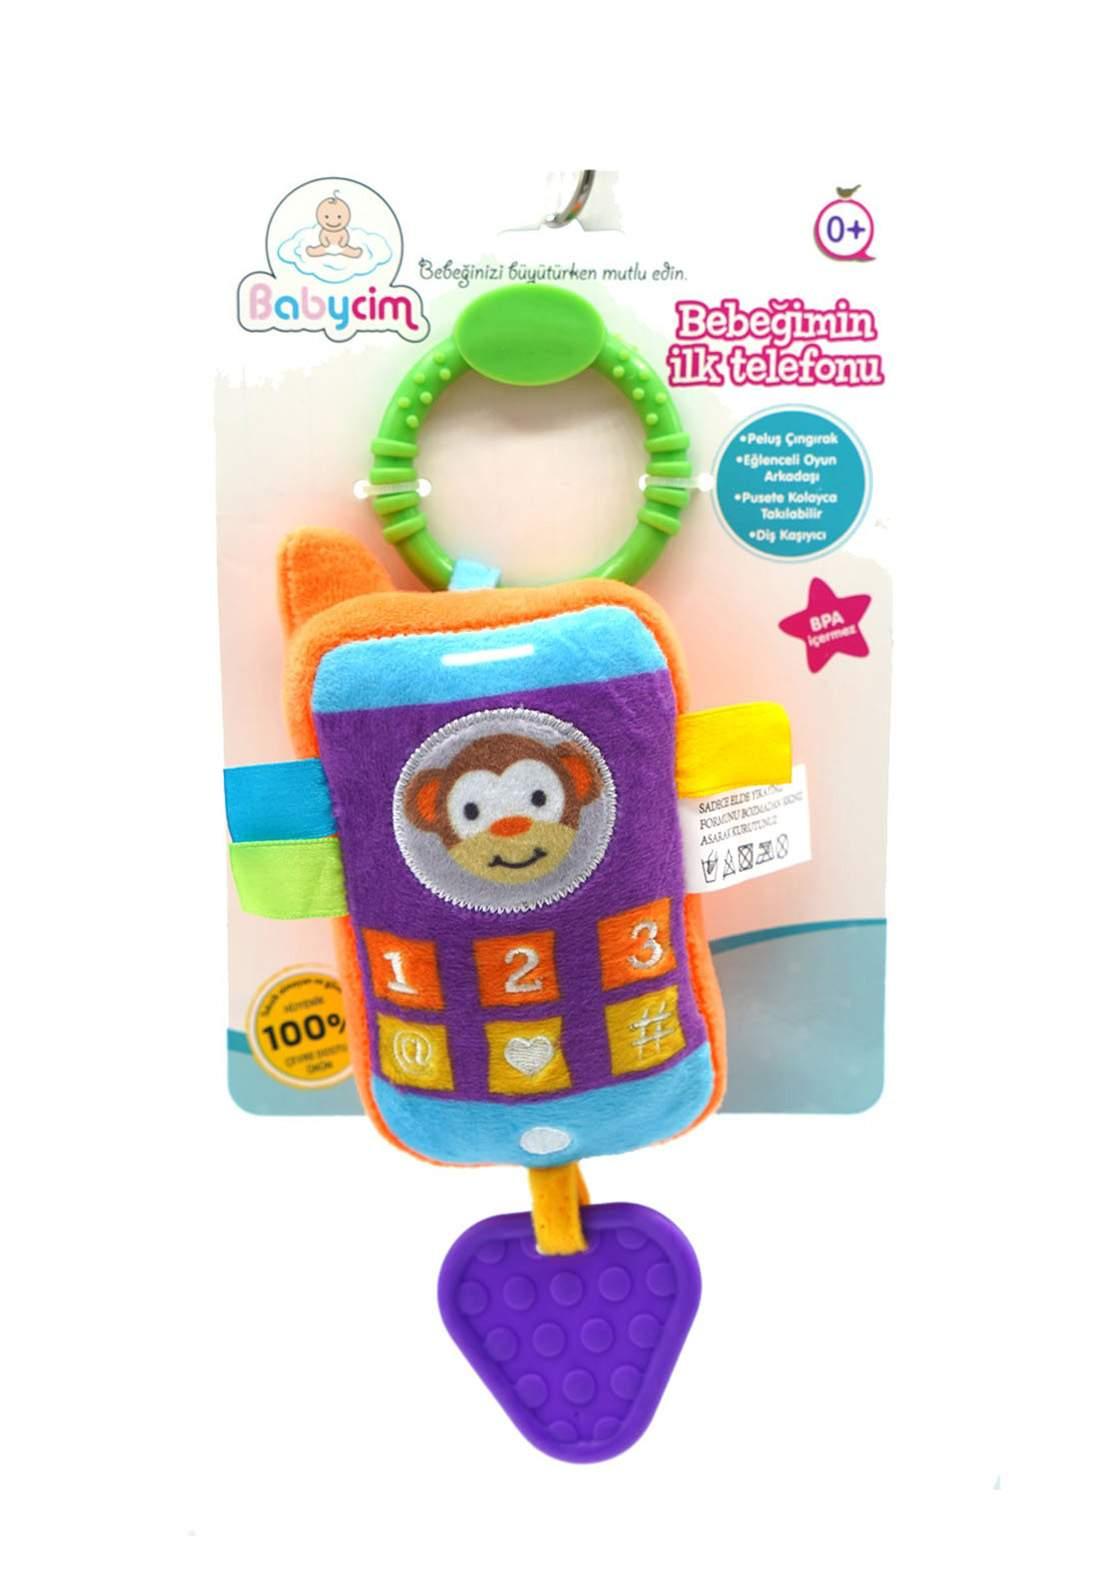 Babycim Baby's First Phone لعبة للأطفال